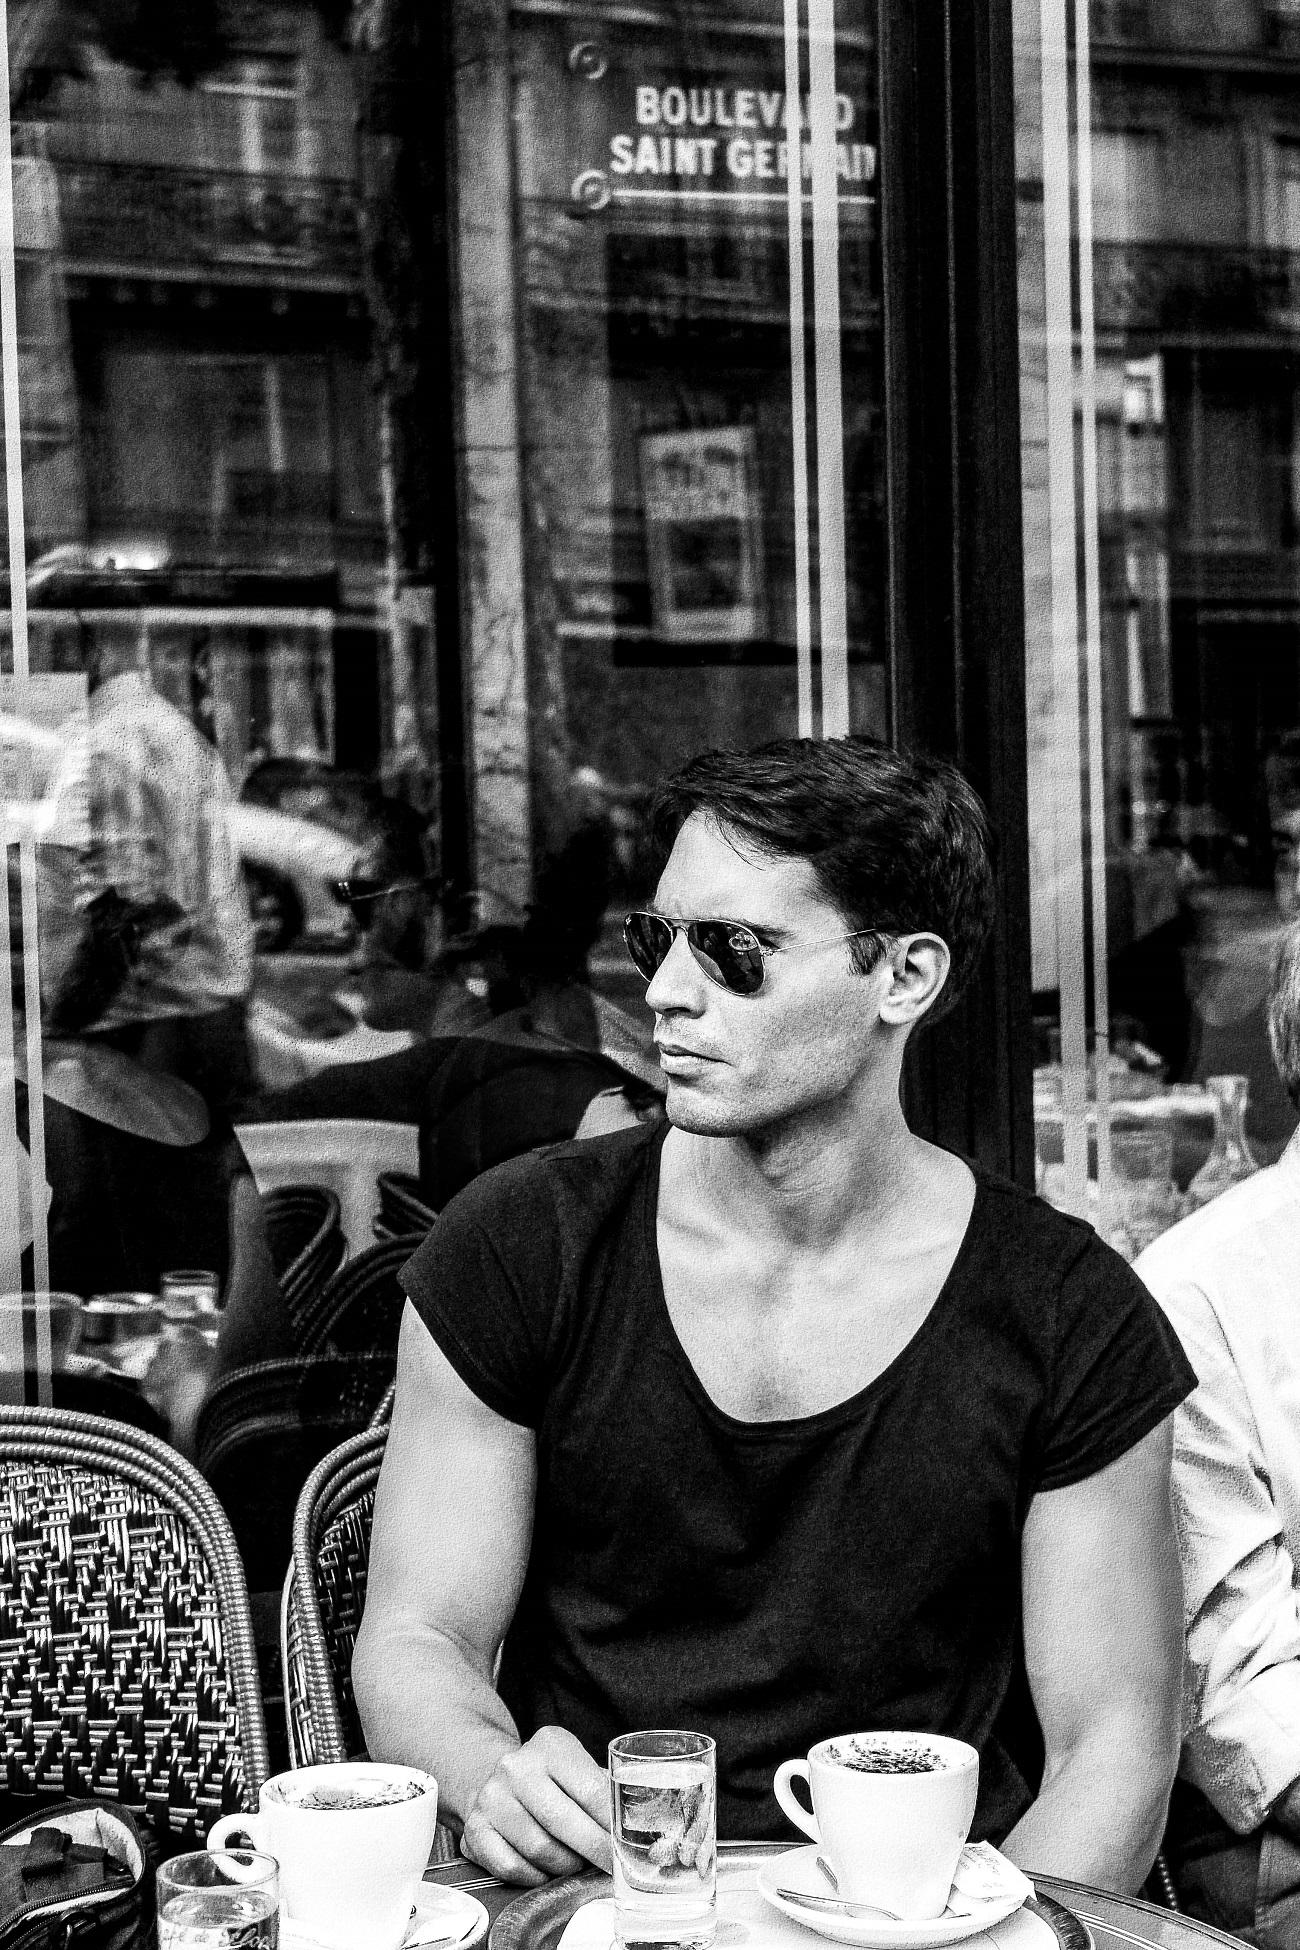 Vukota Brajovic at Café de Flore in Paris. Style  by Vukota